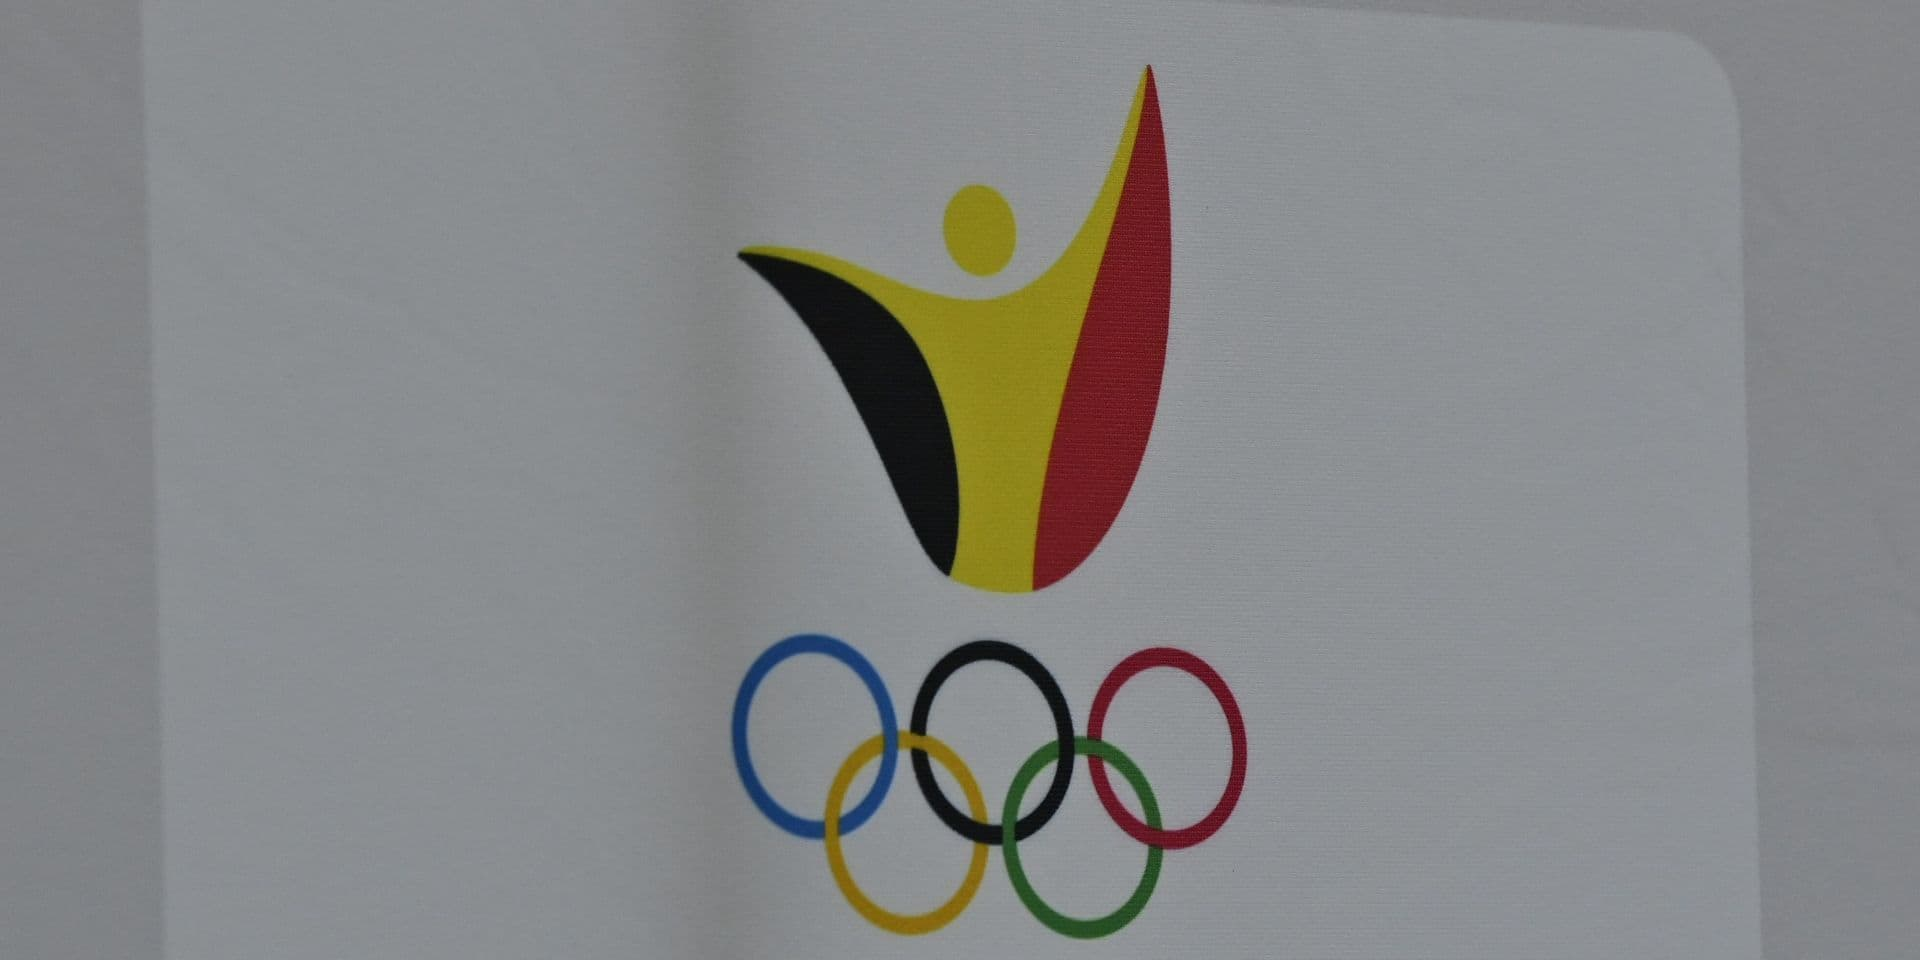 Intempéries: le Team Belgium observera une minute de silence au village olympique de Tokyo mardi